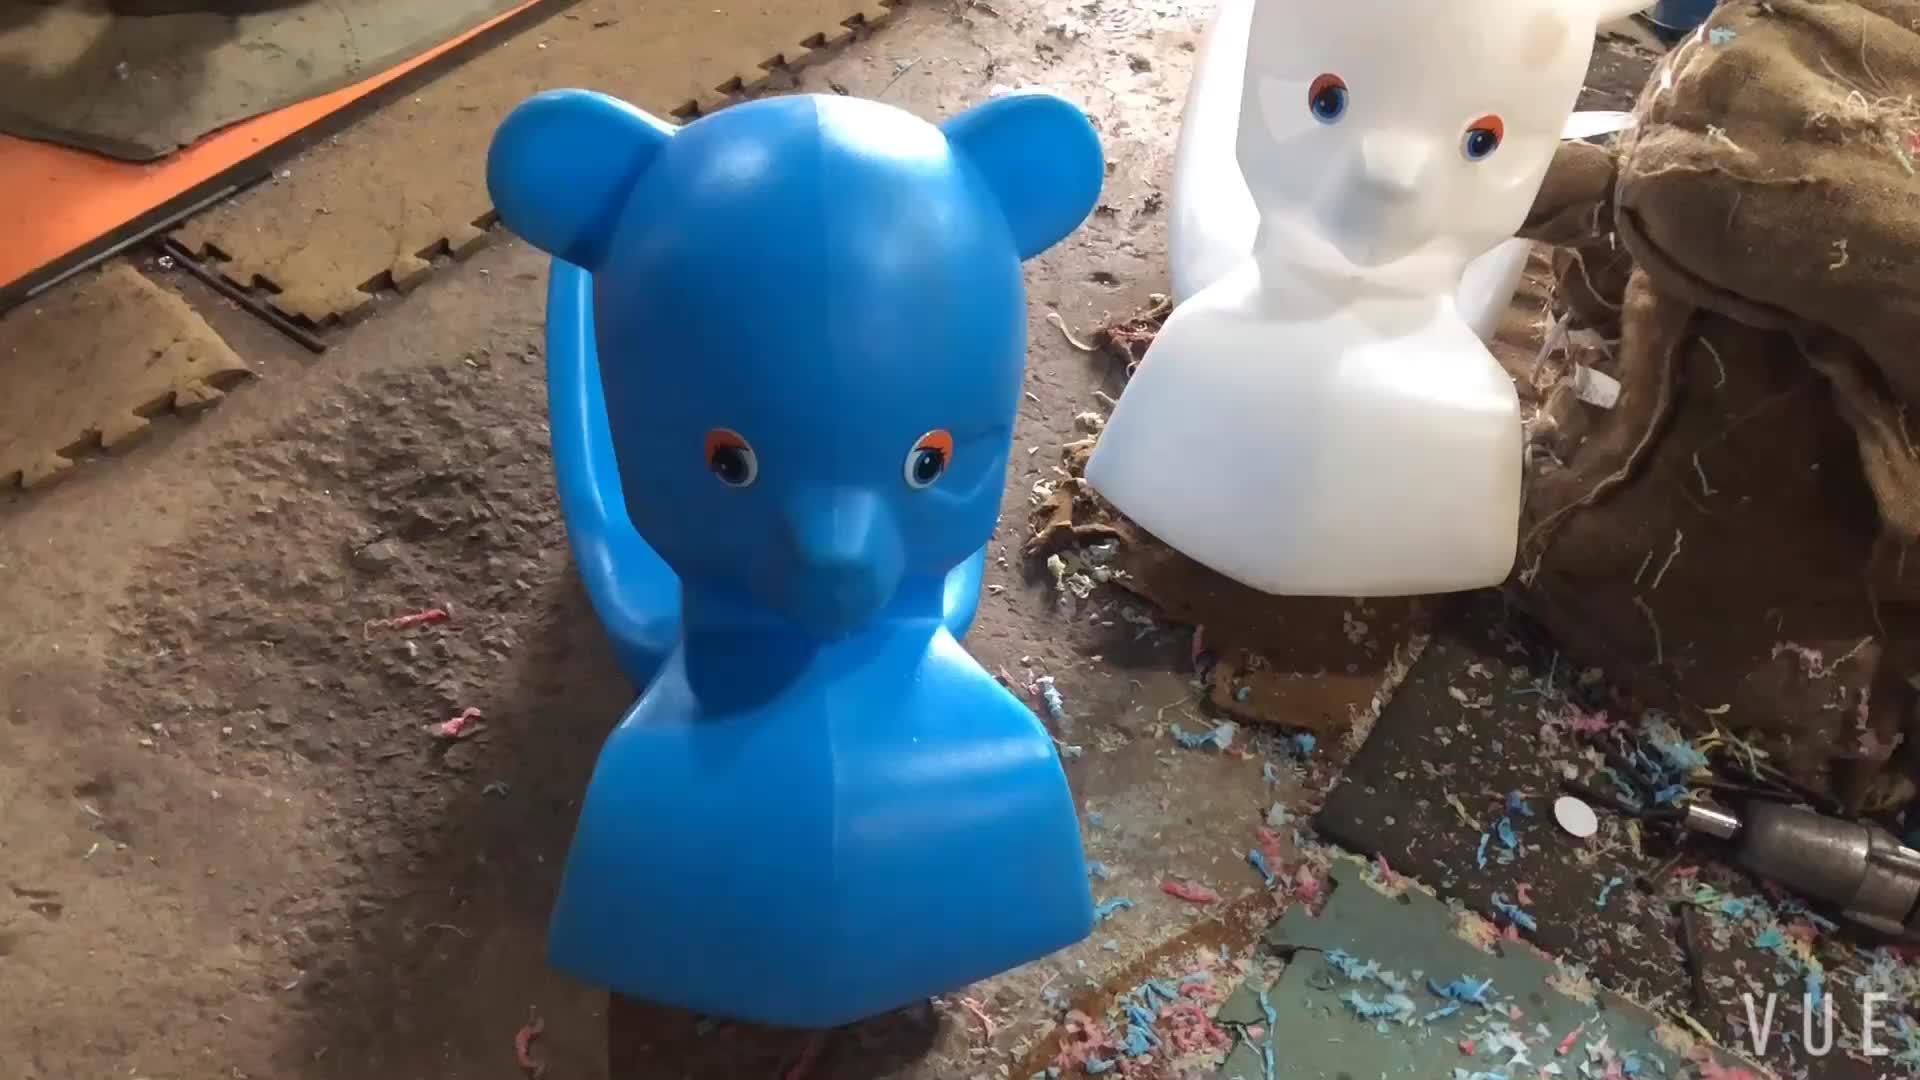 TK Mainan Plastik Desain Hewan Kuda Goyang Mainan Anak-anak Bermain Naik Mainan